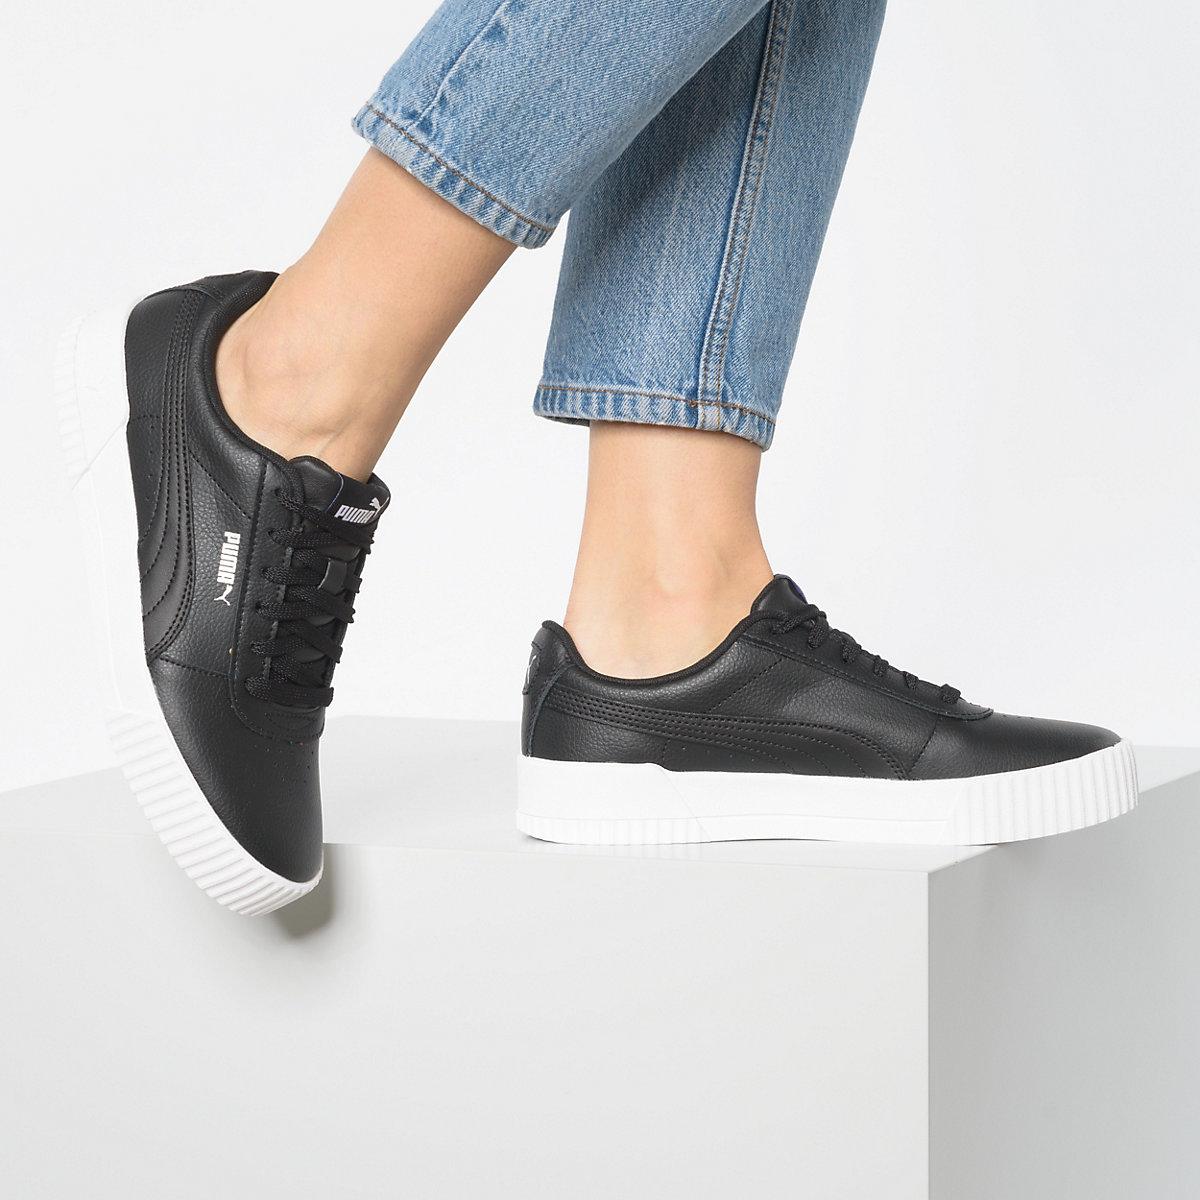 Puma, Carina L Sneakers Low, Schwarz